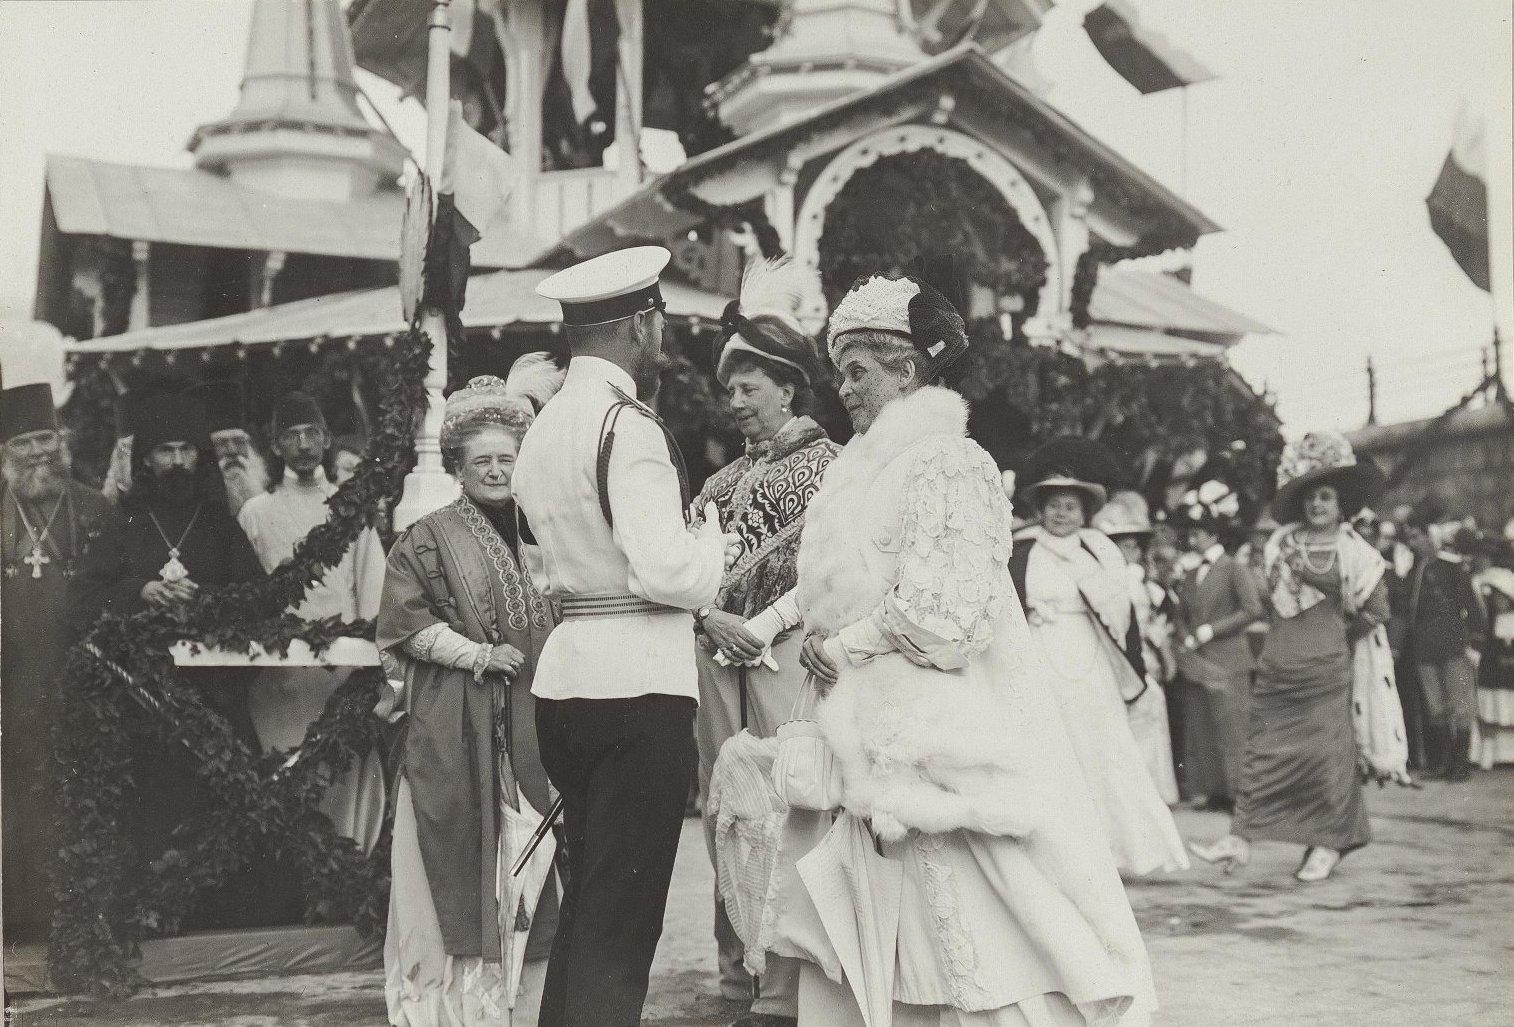 10. Император Николай II и Зинаида Николаевна Юсупова